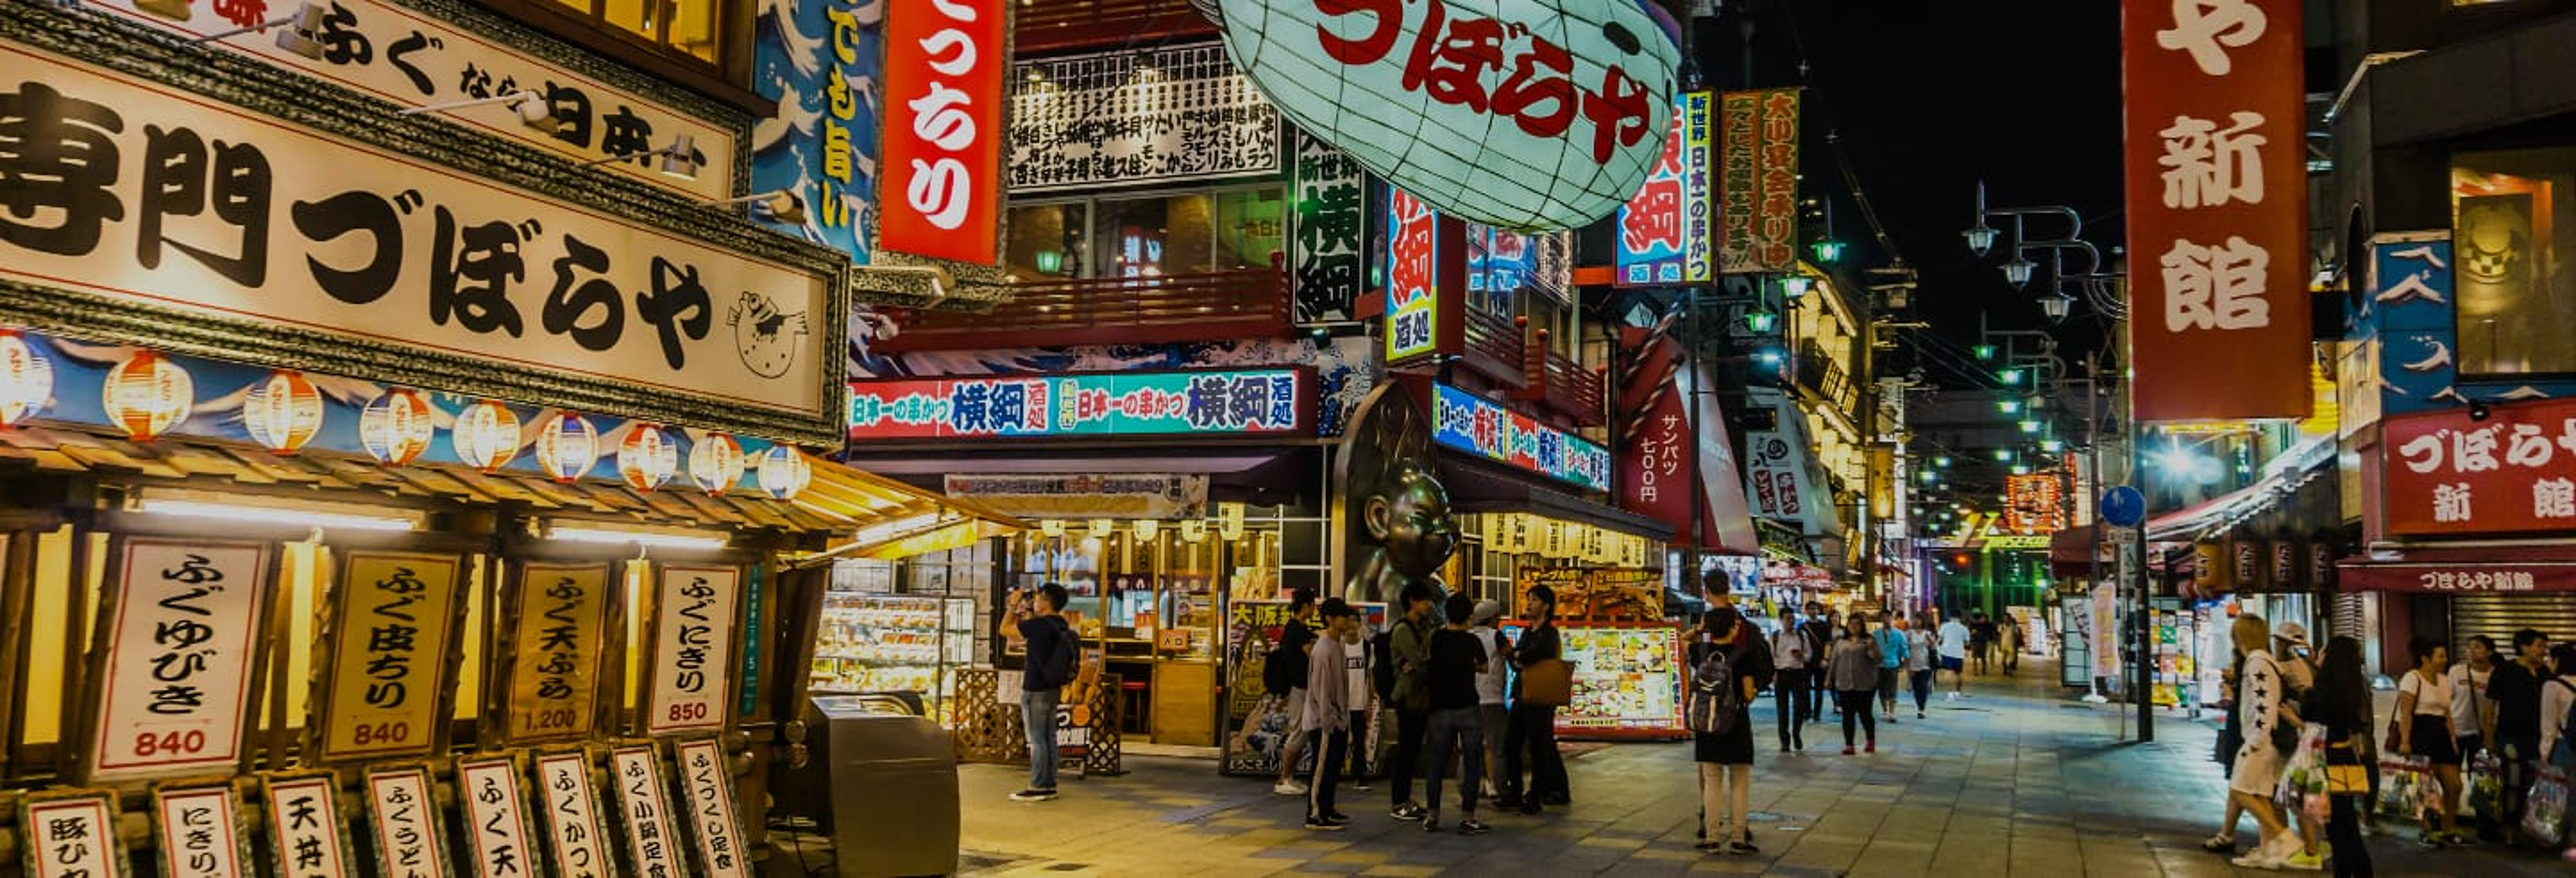 Visite de nuit dans Osaka